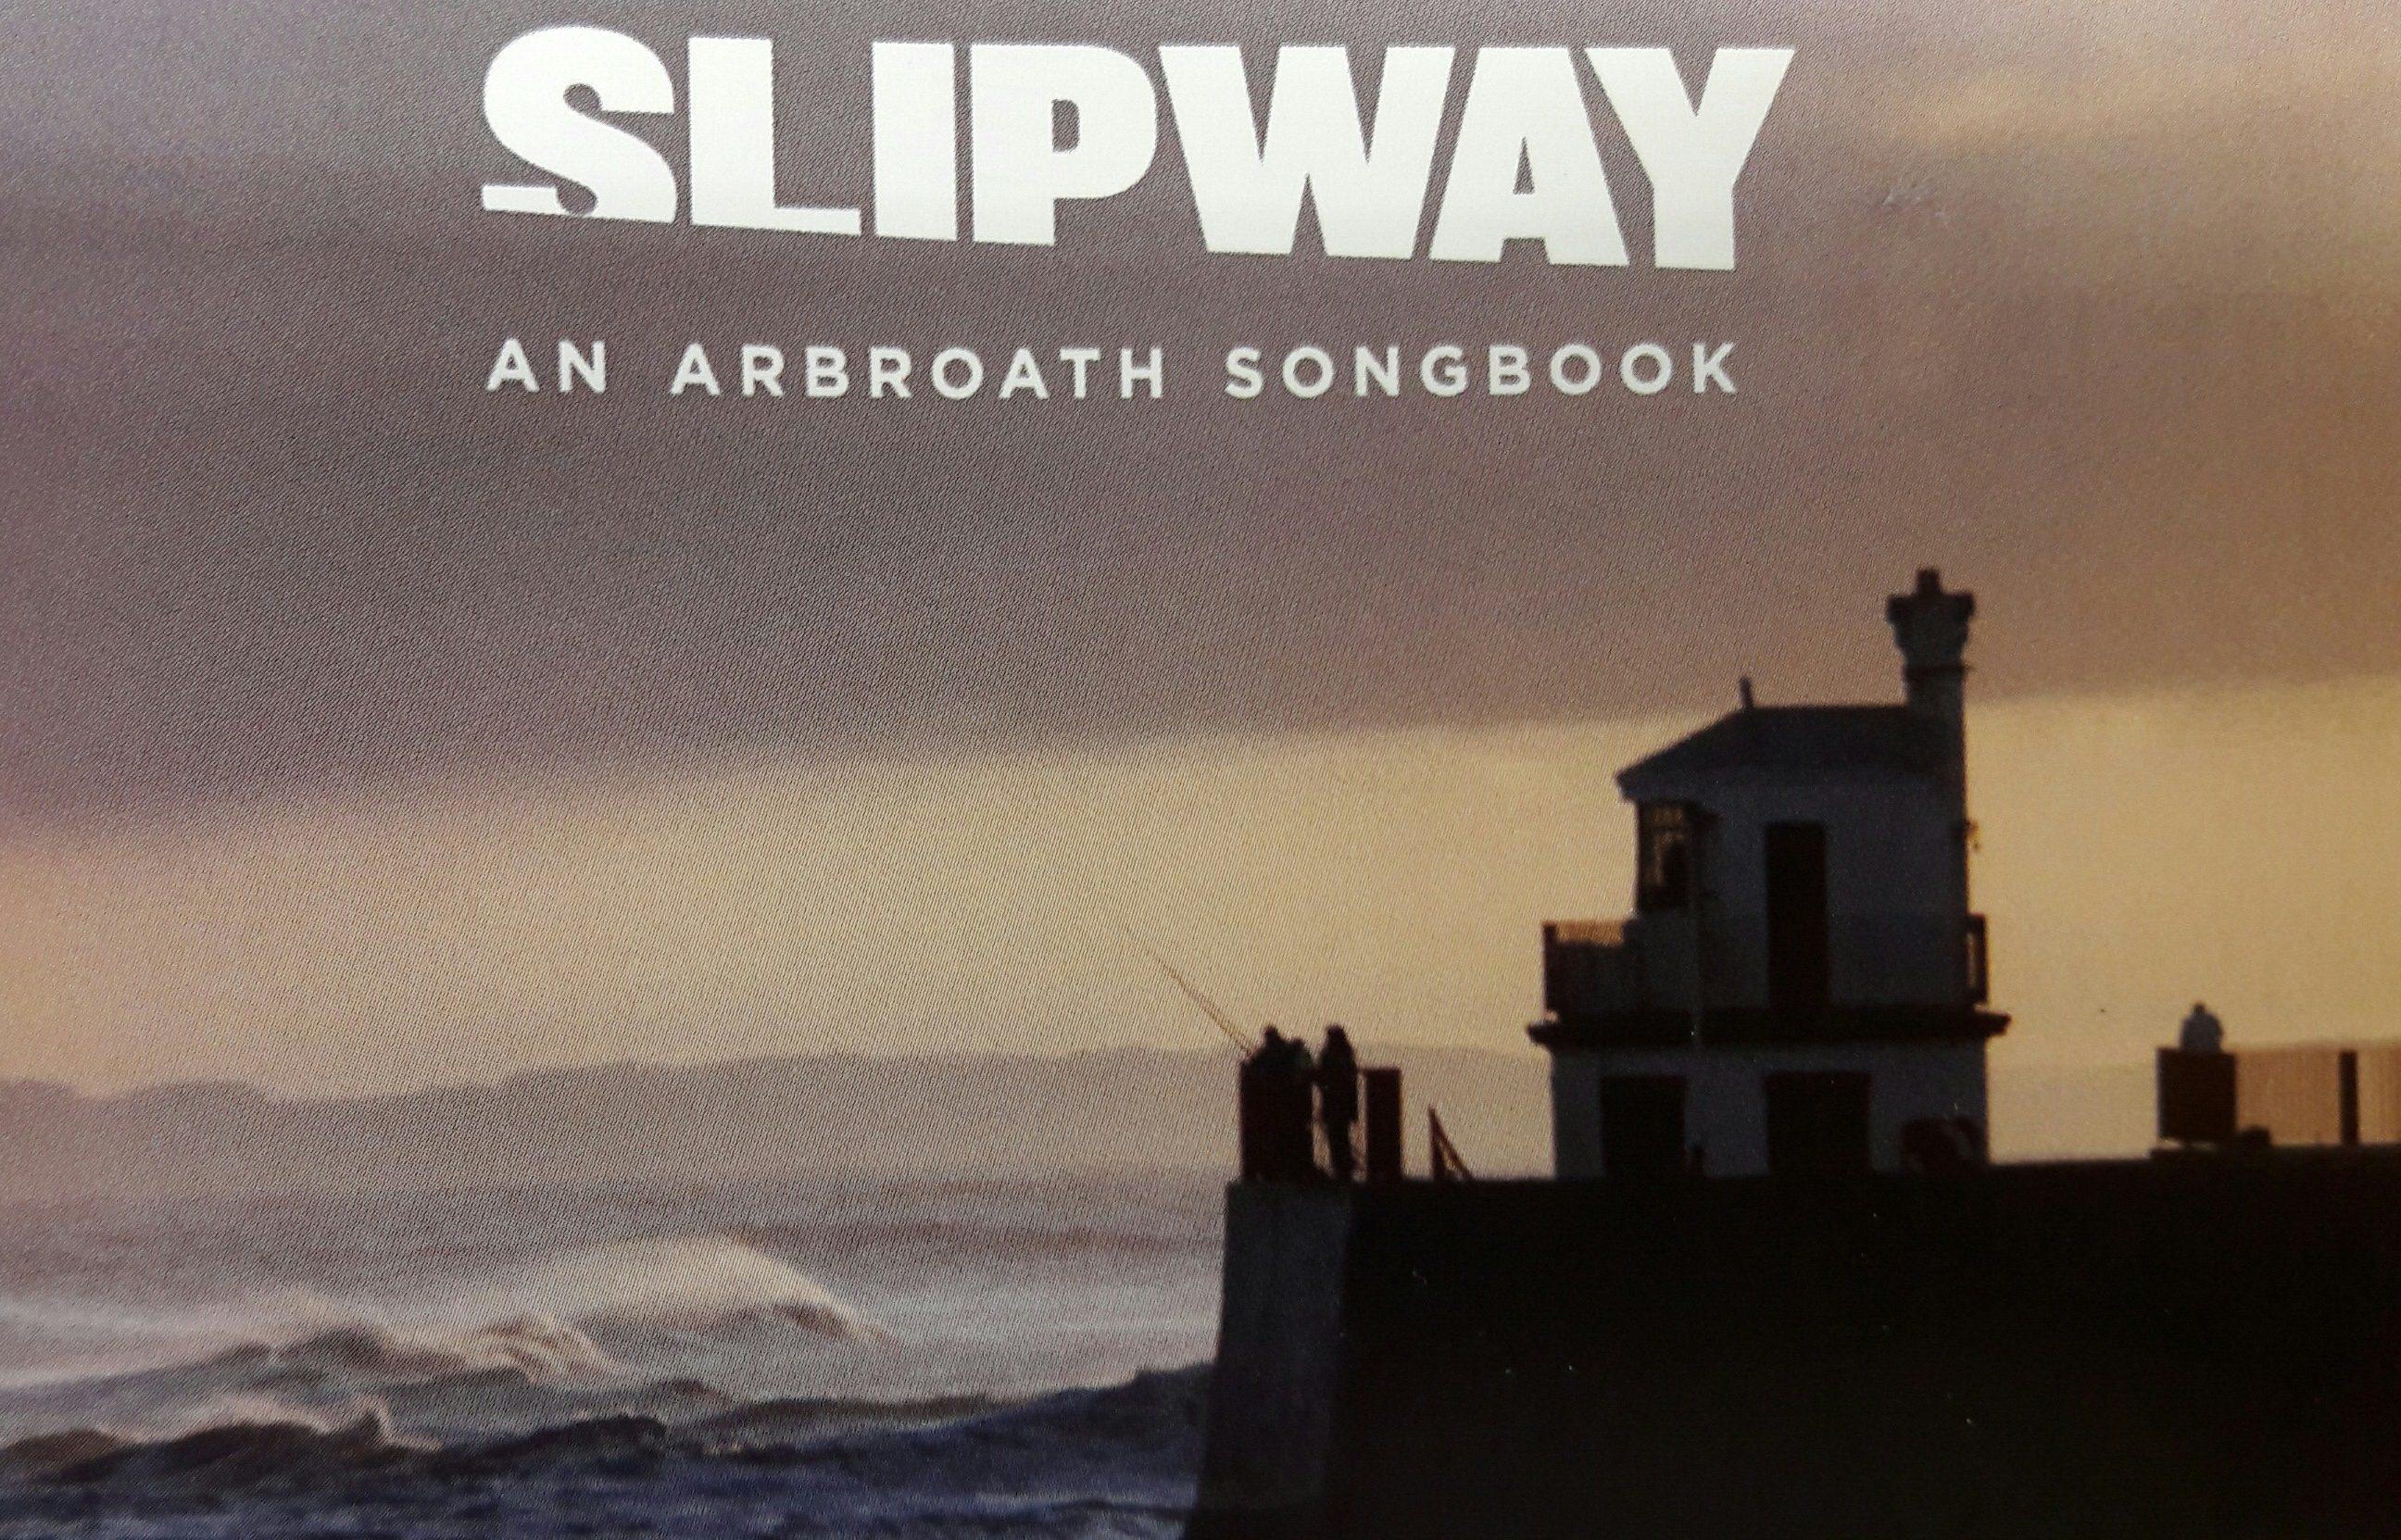 Slipway: An Arbroath Songbook.